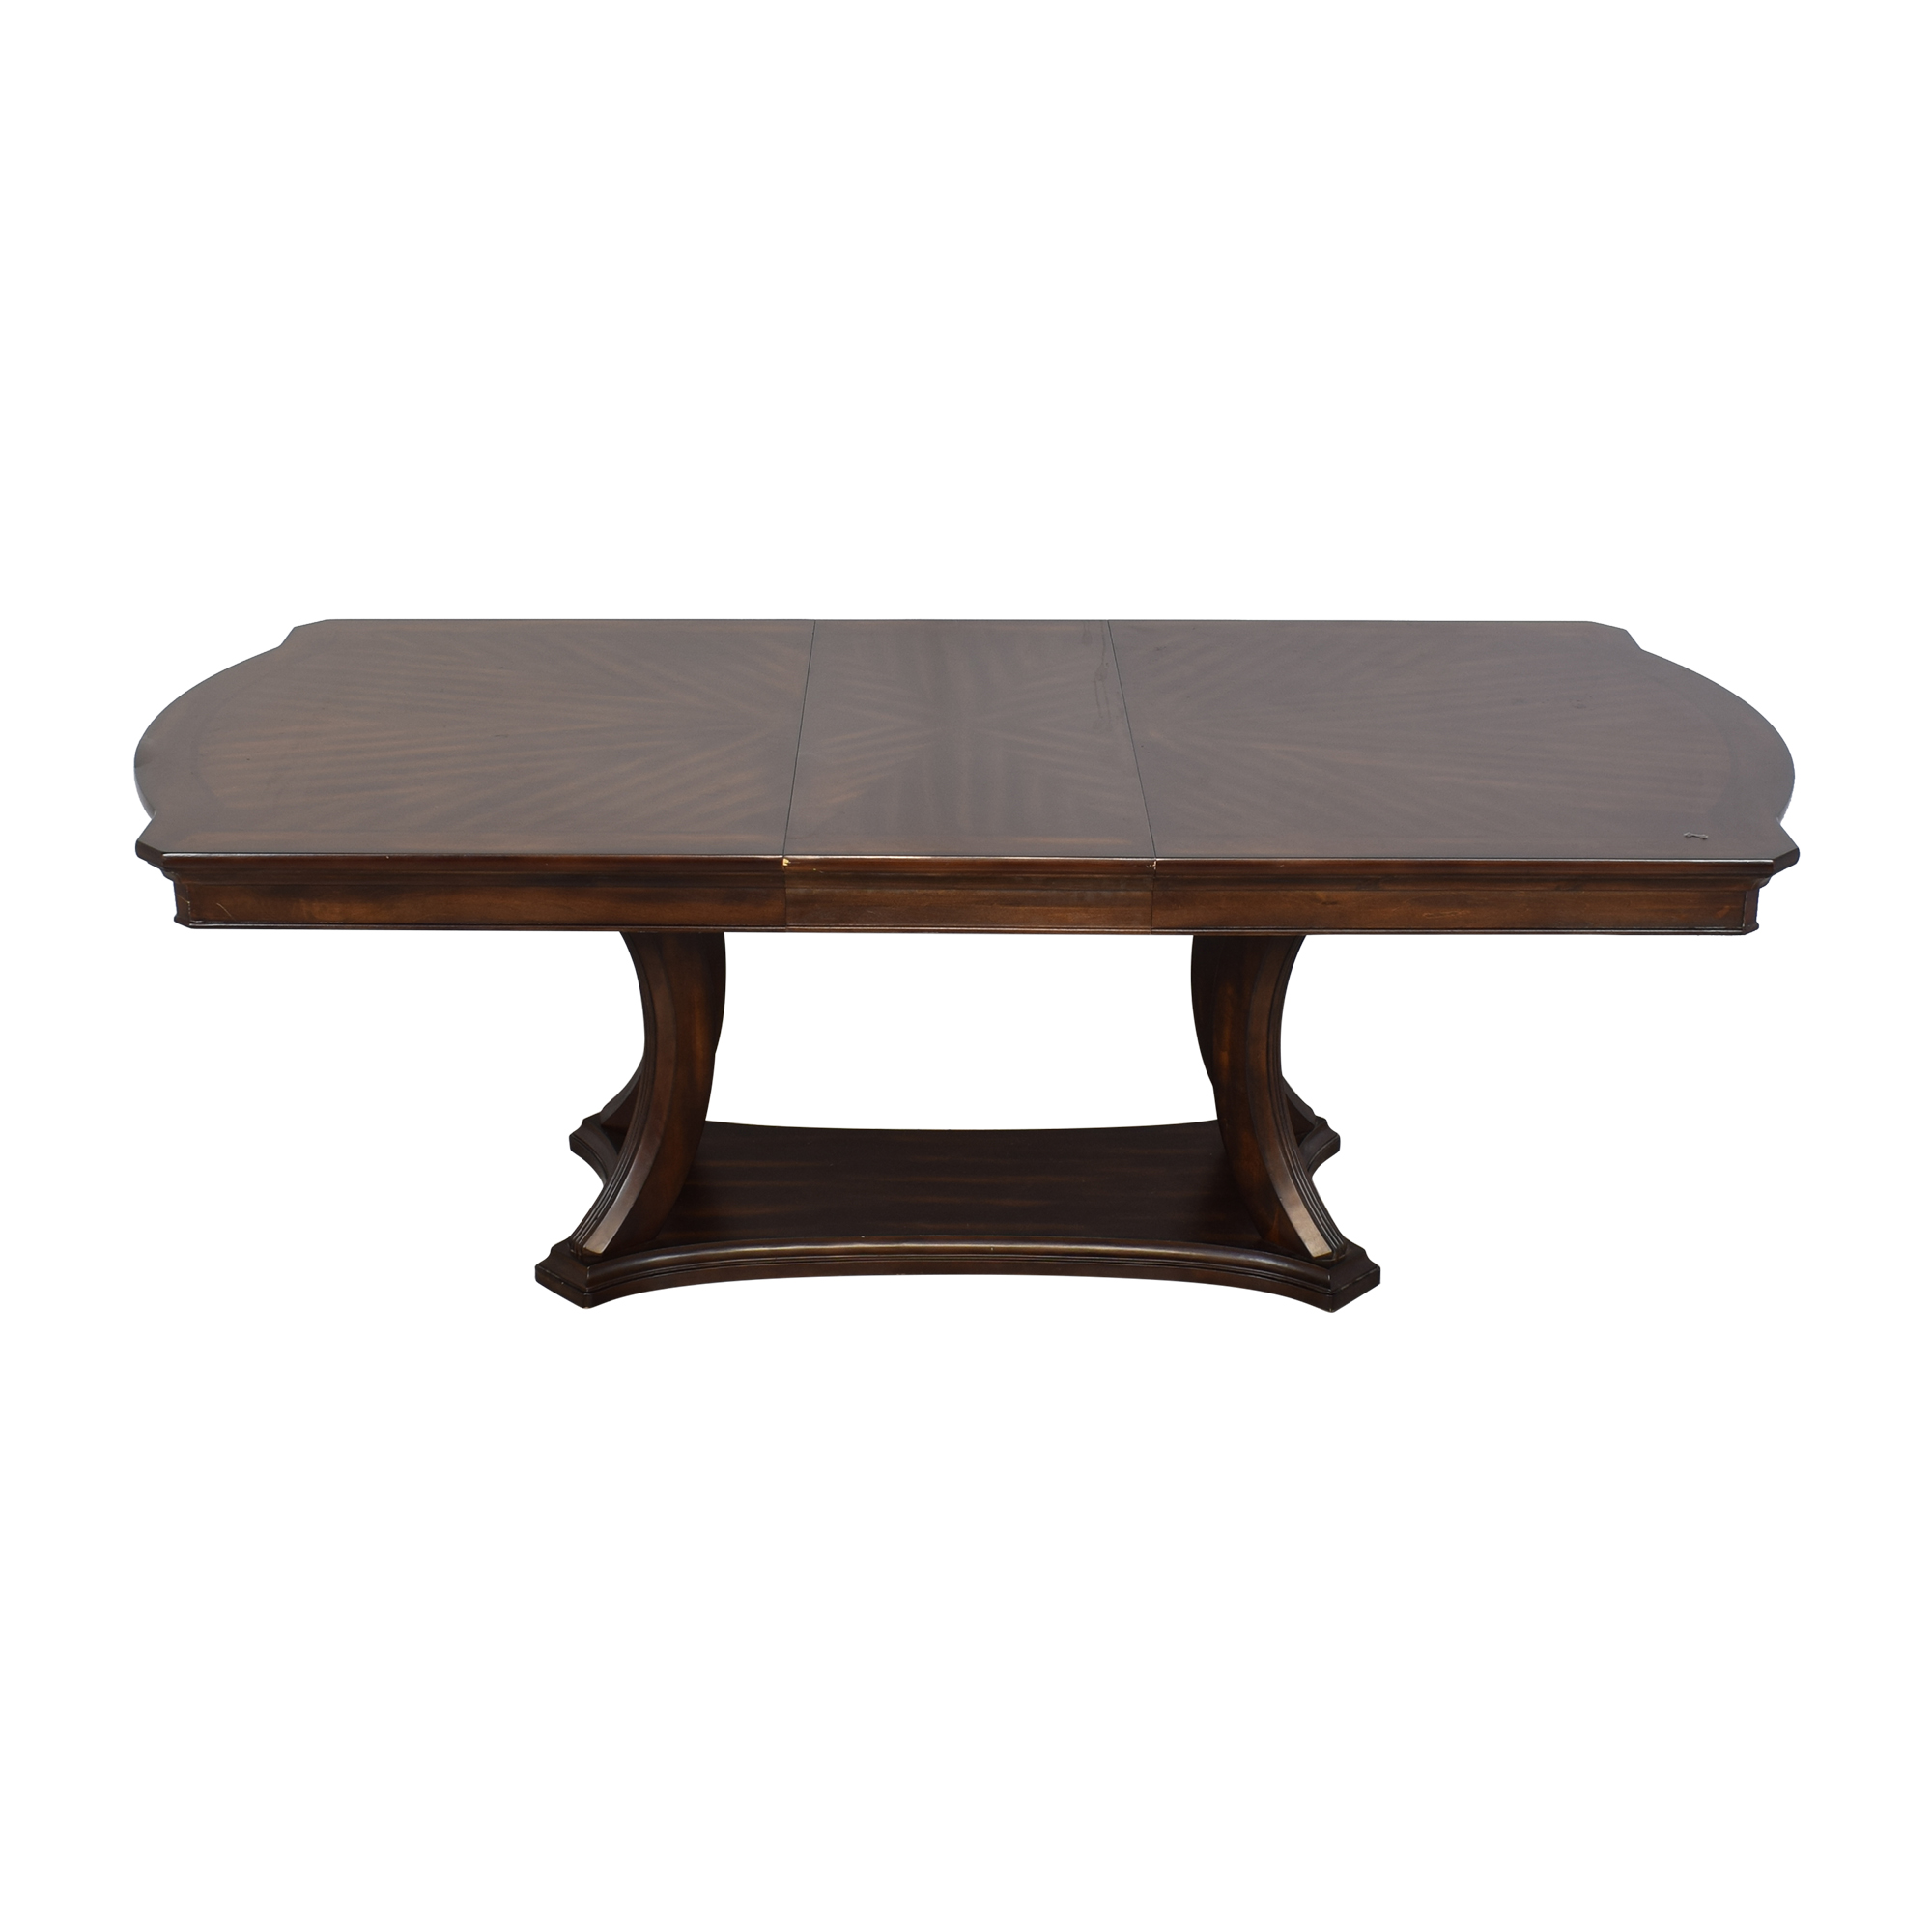 Pedestal Base Extendable Dining Table dark brown